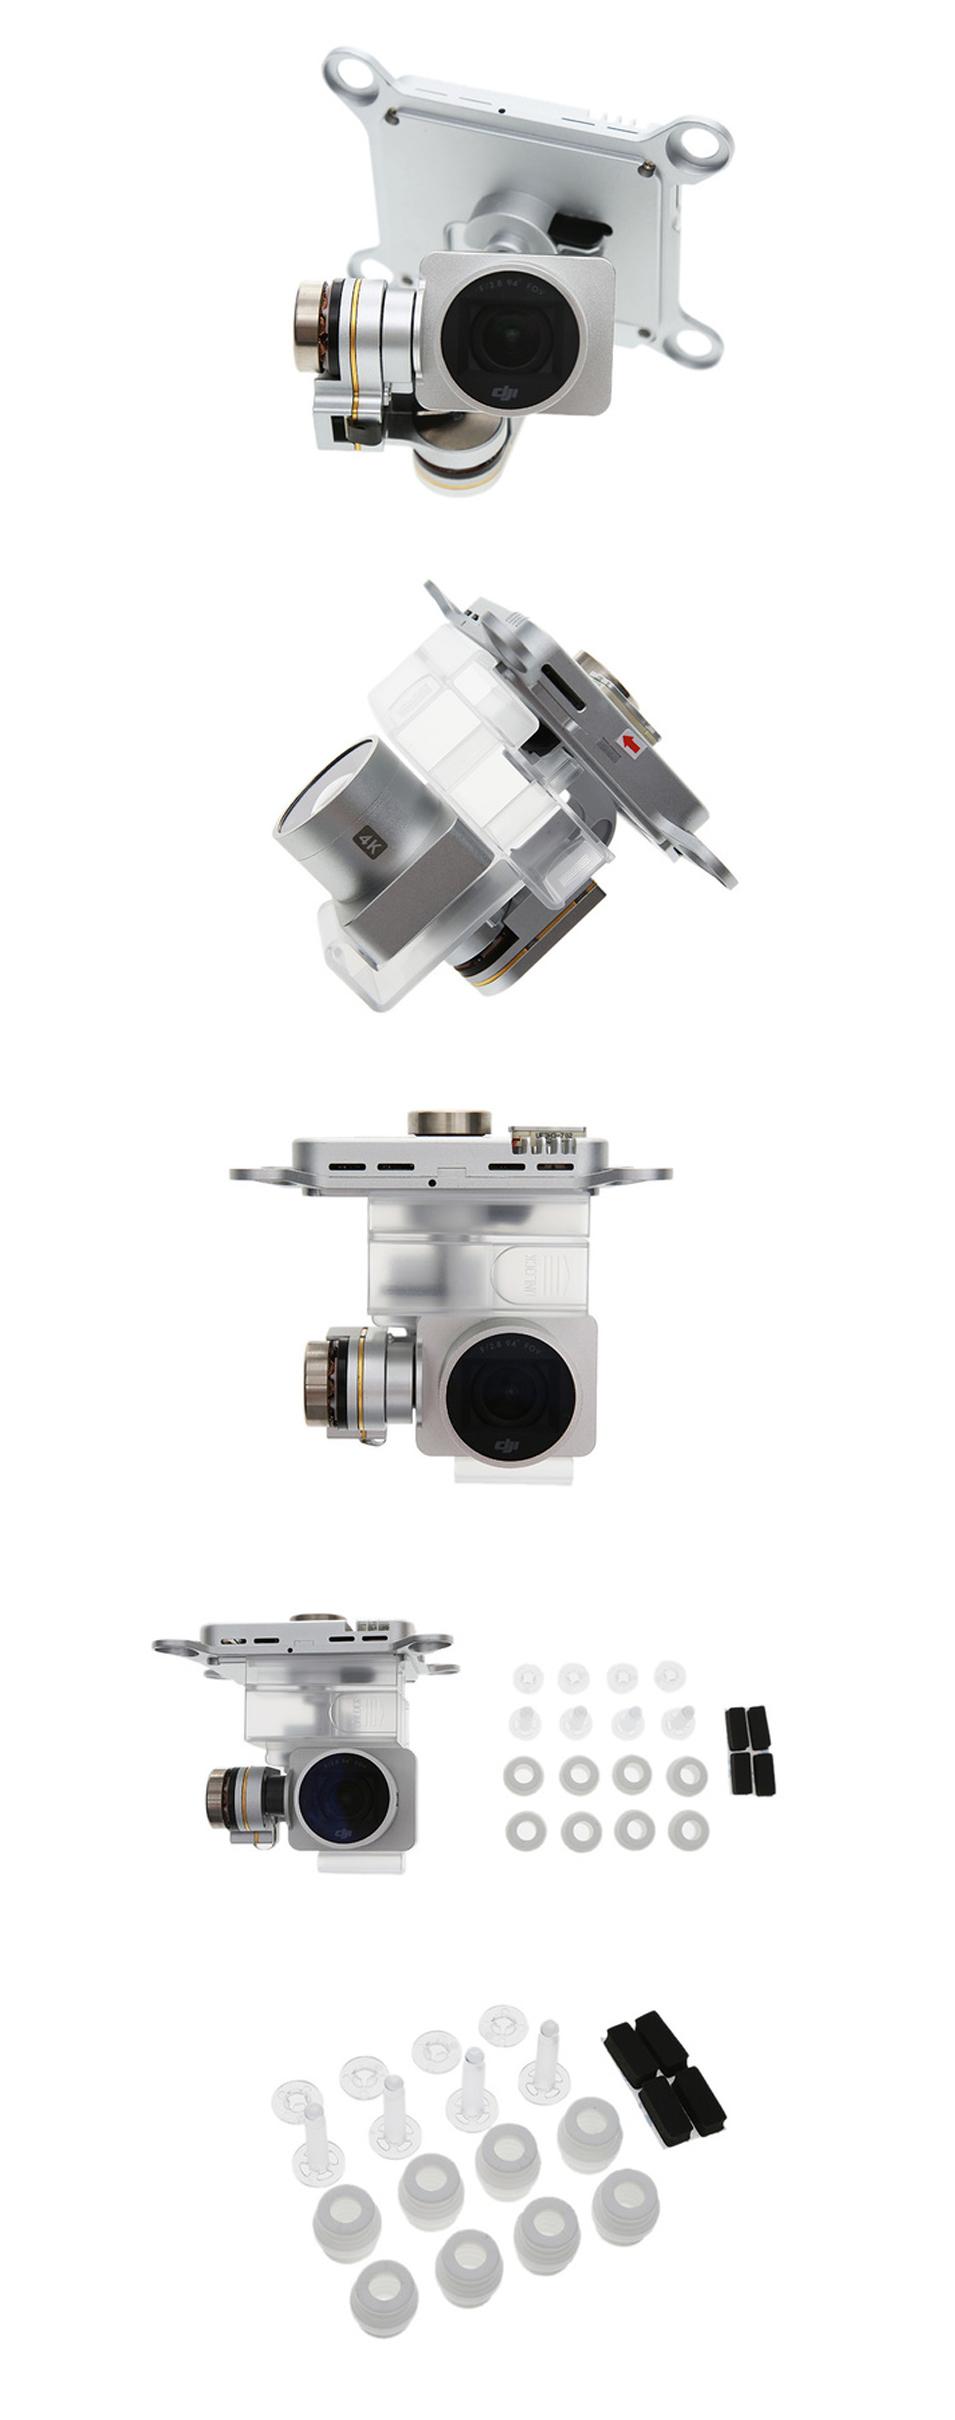 Phantom3, 드론, Drone, DJI, 제이씨현시스템